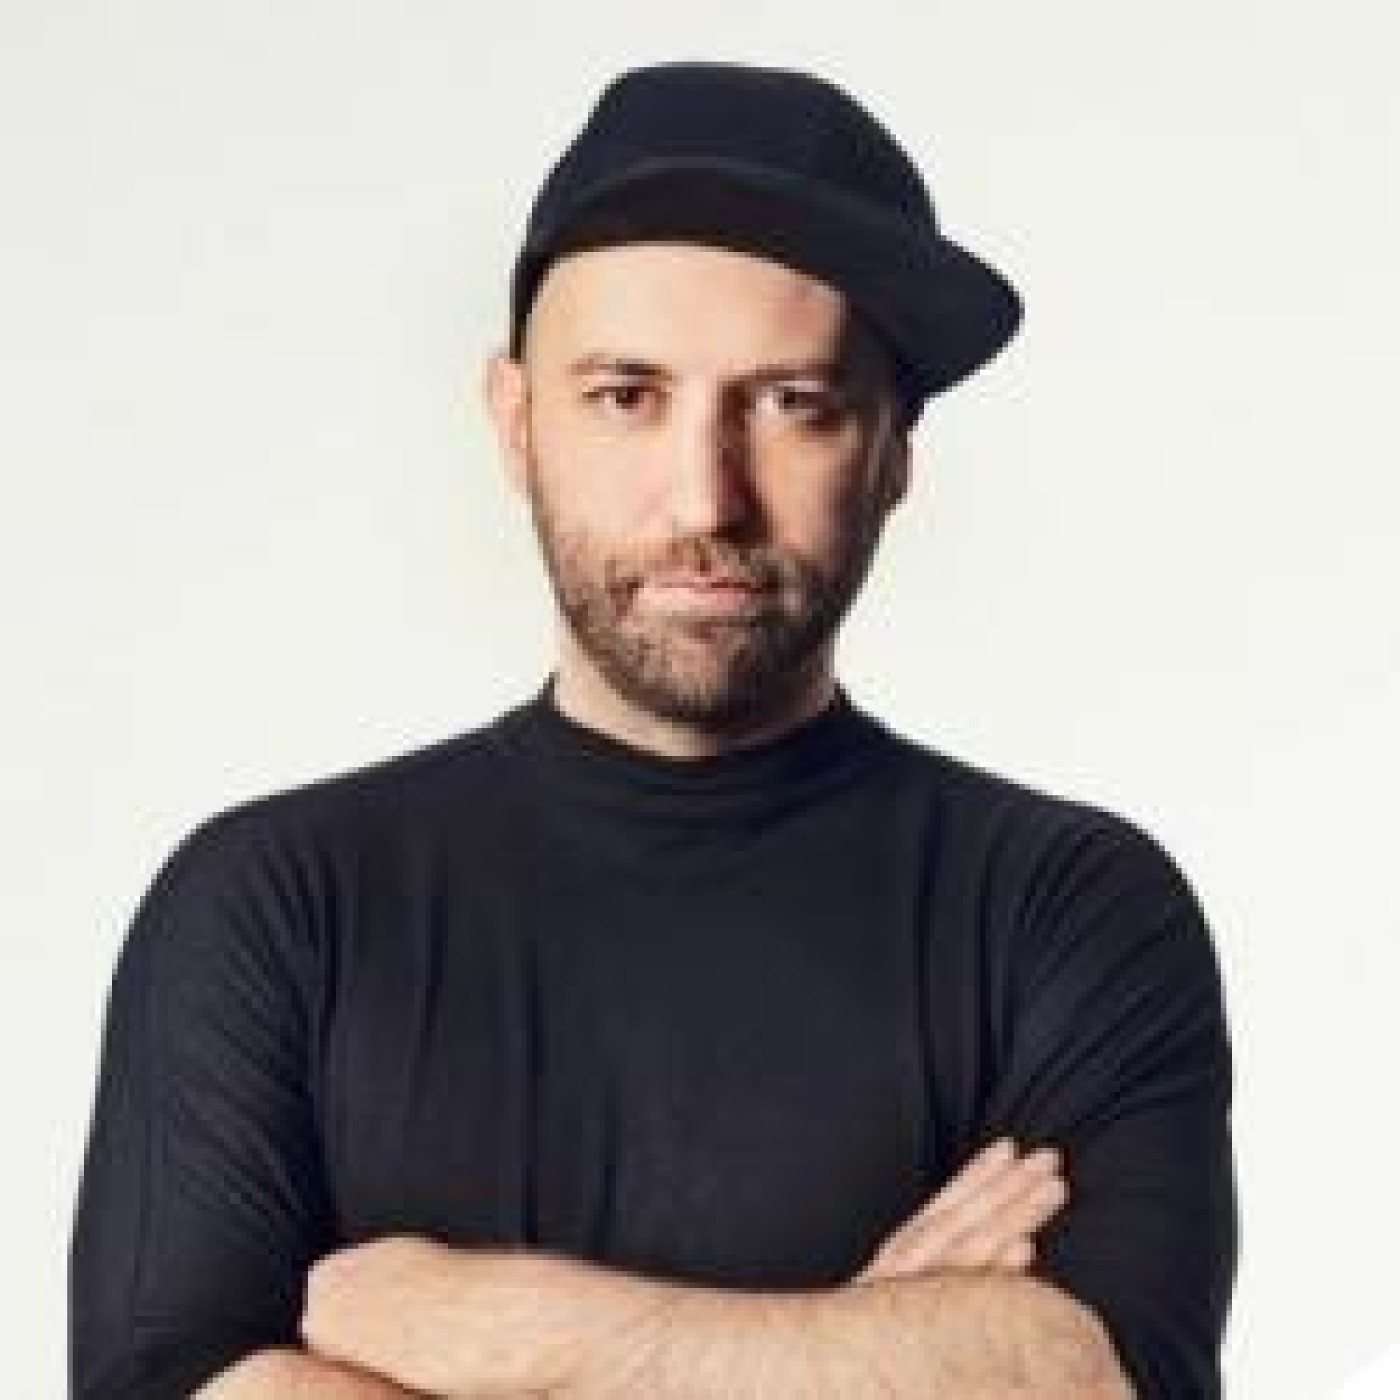 LA NUIT MAXXIMUM SUR FG : JOE METZENMACHER